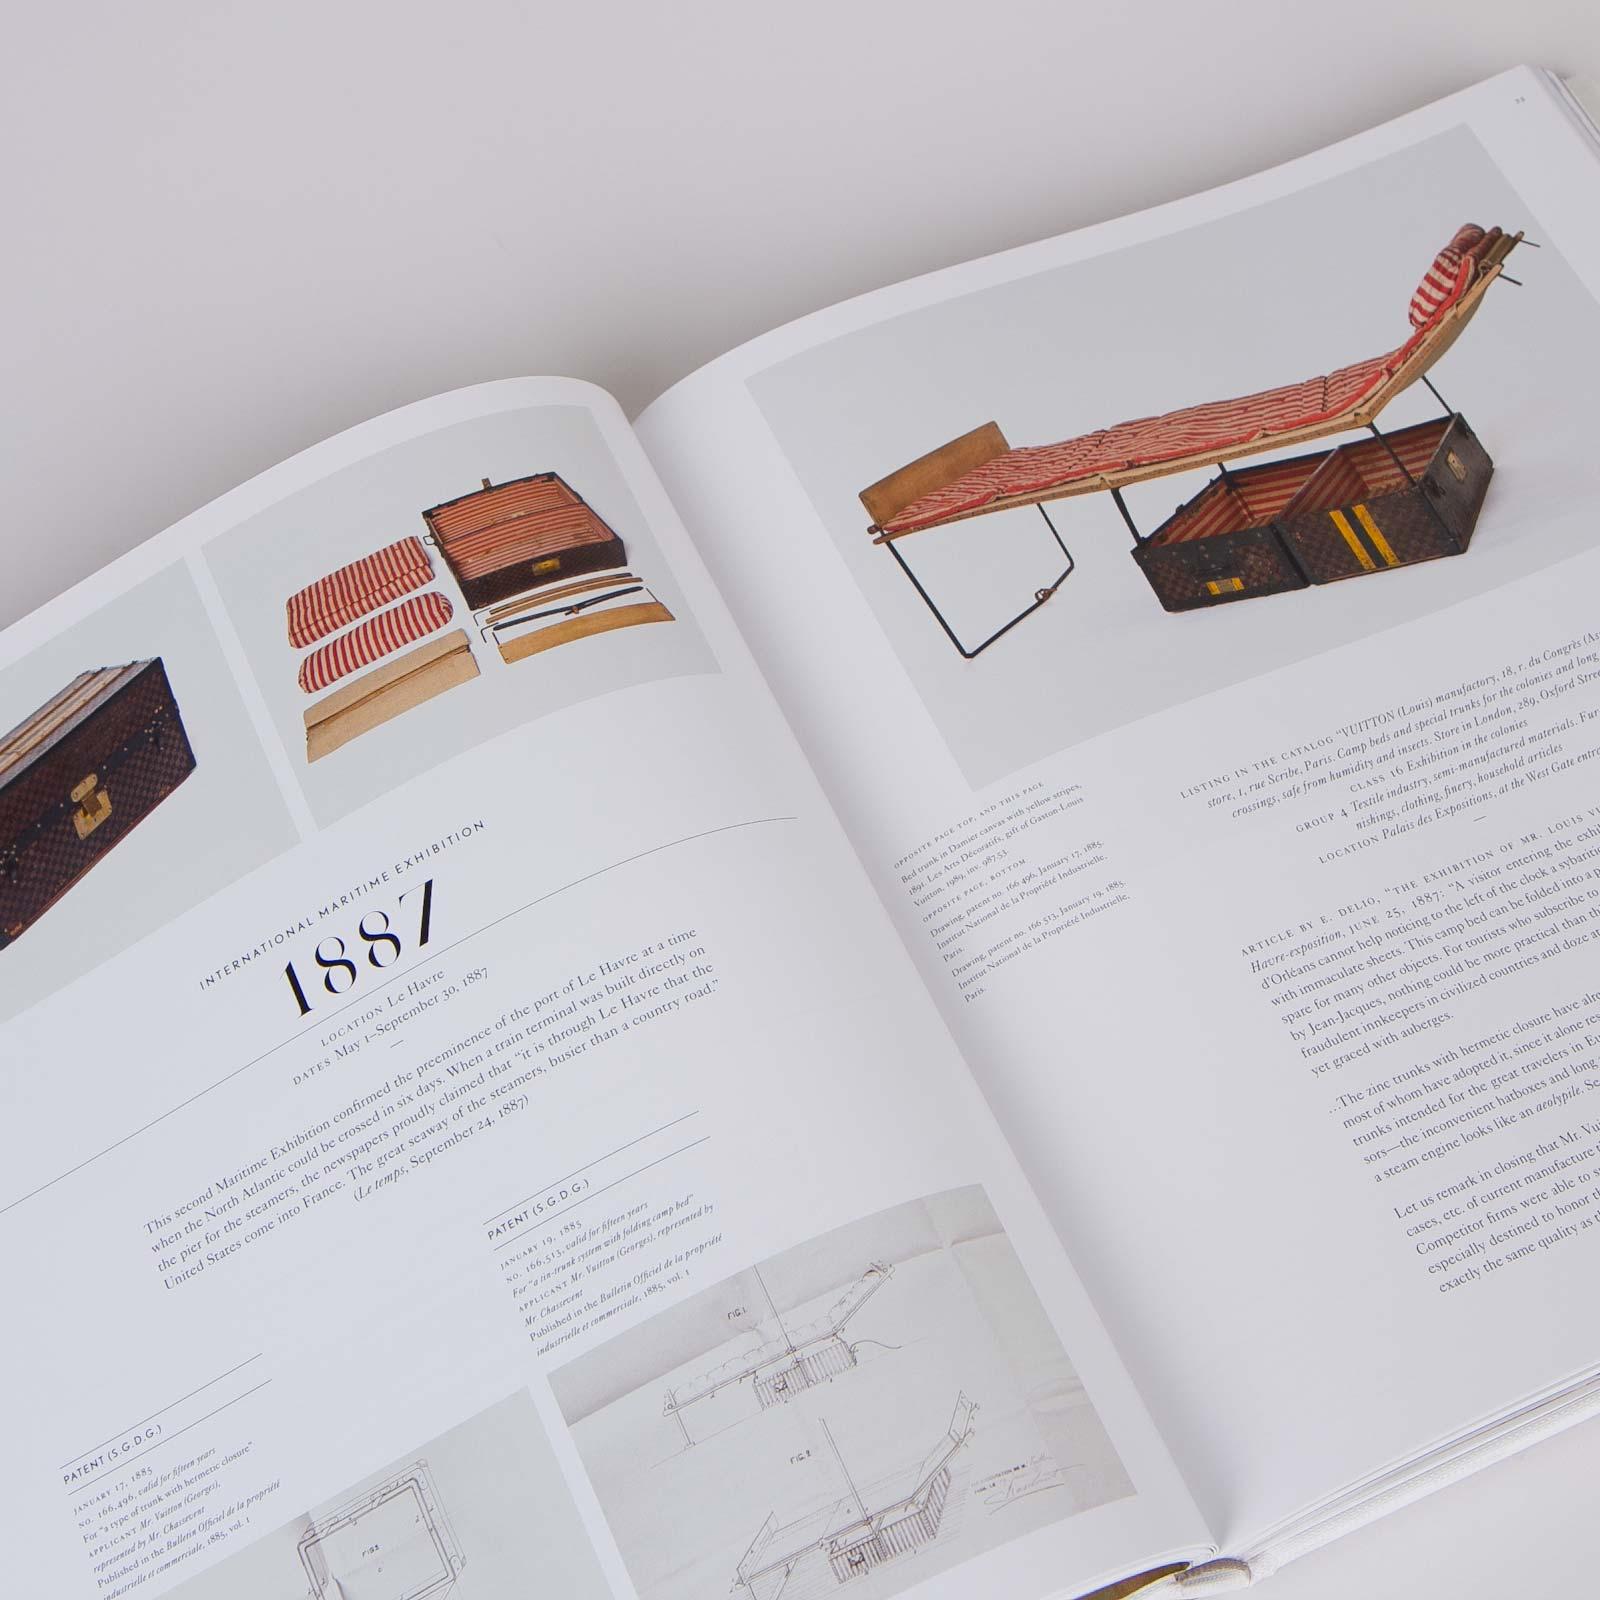 db370485f8c2 Books Louis Vuitton Marc Jacobs - Rizzoli-LV-MarcJacobs-Book -  Sneakersnstuff